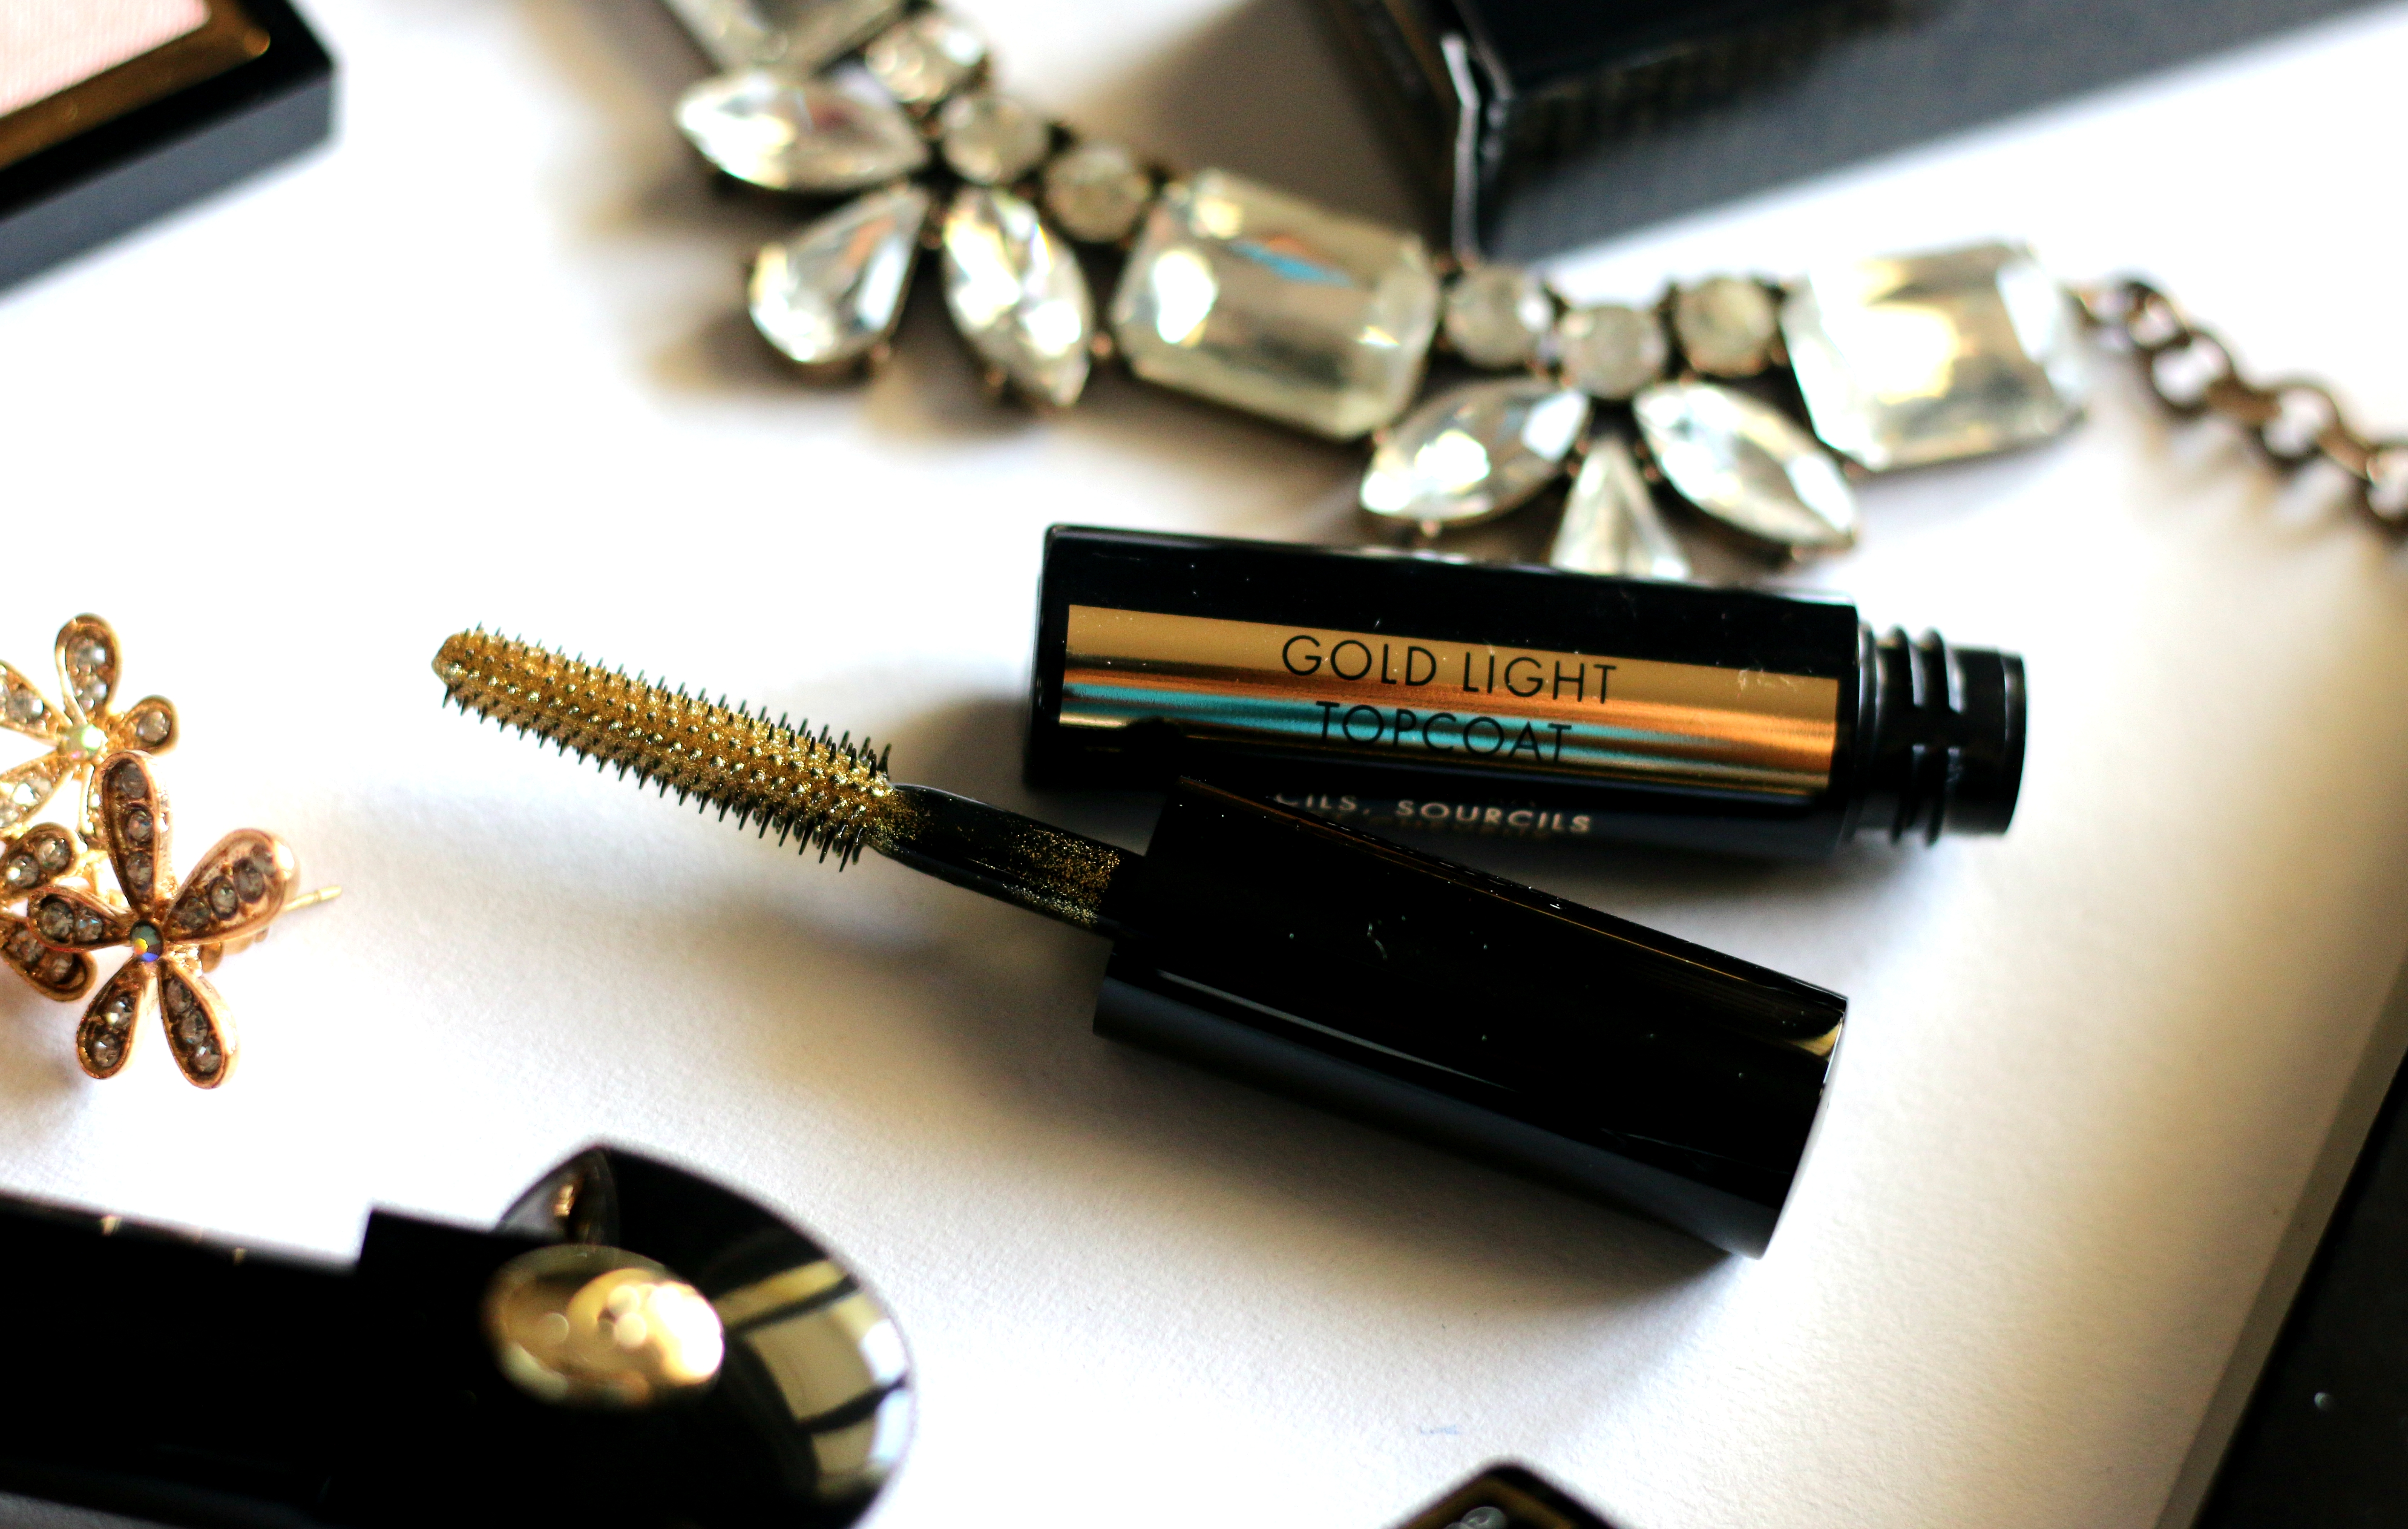 Guerlain Holiday 2017 – Gold Light Topcoat Lash, Brow & Hair Gold Mascara